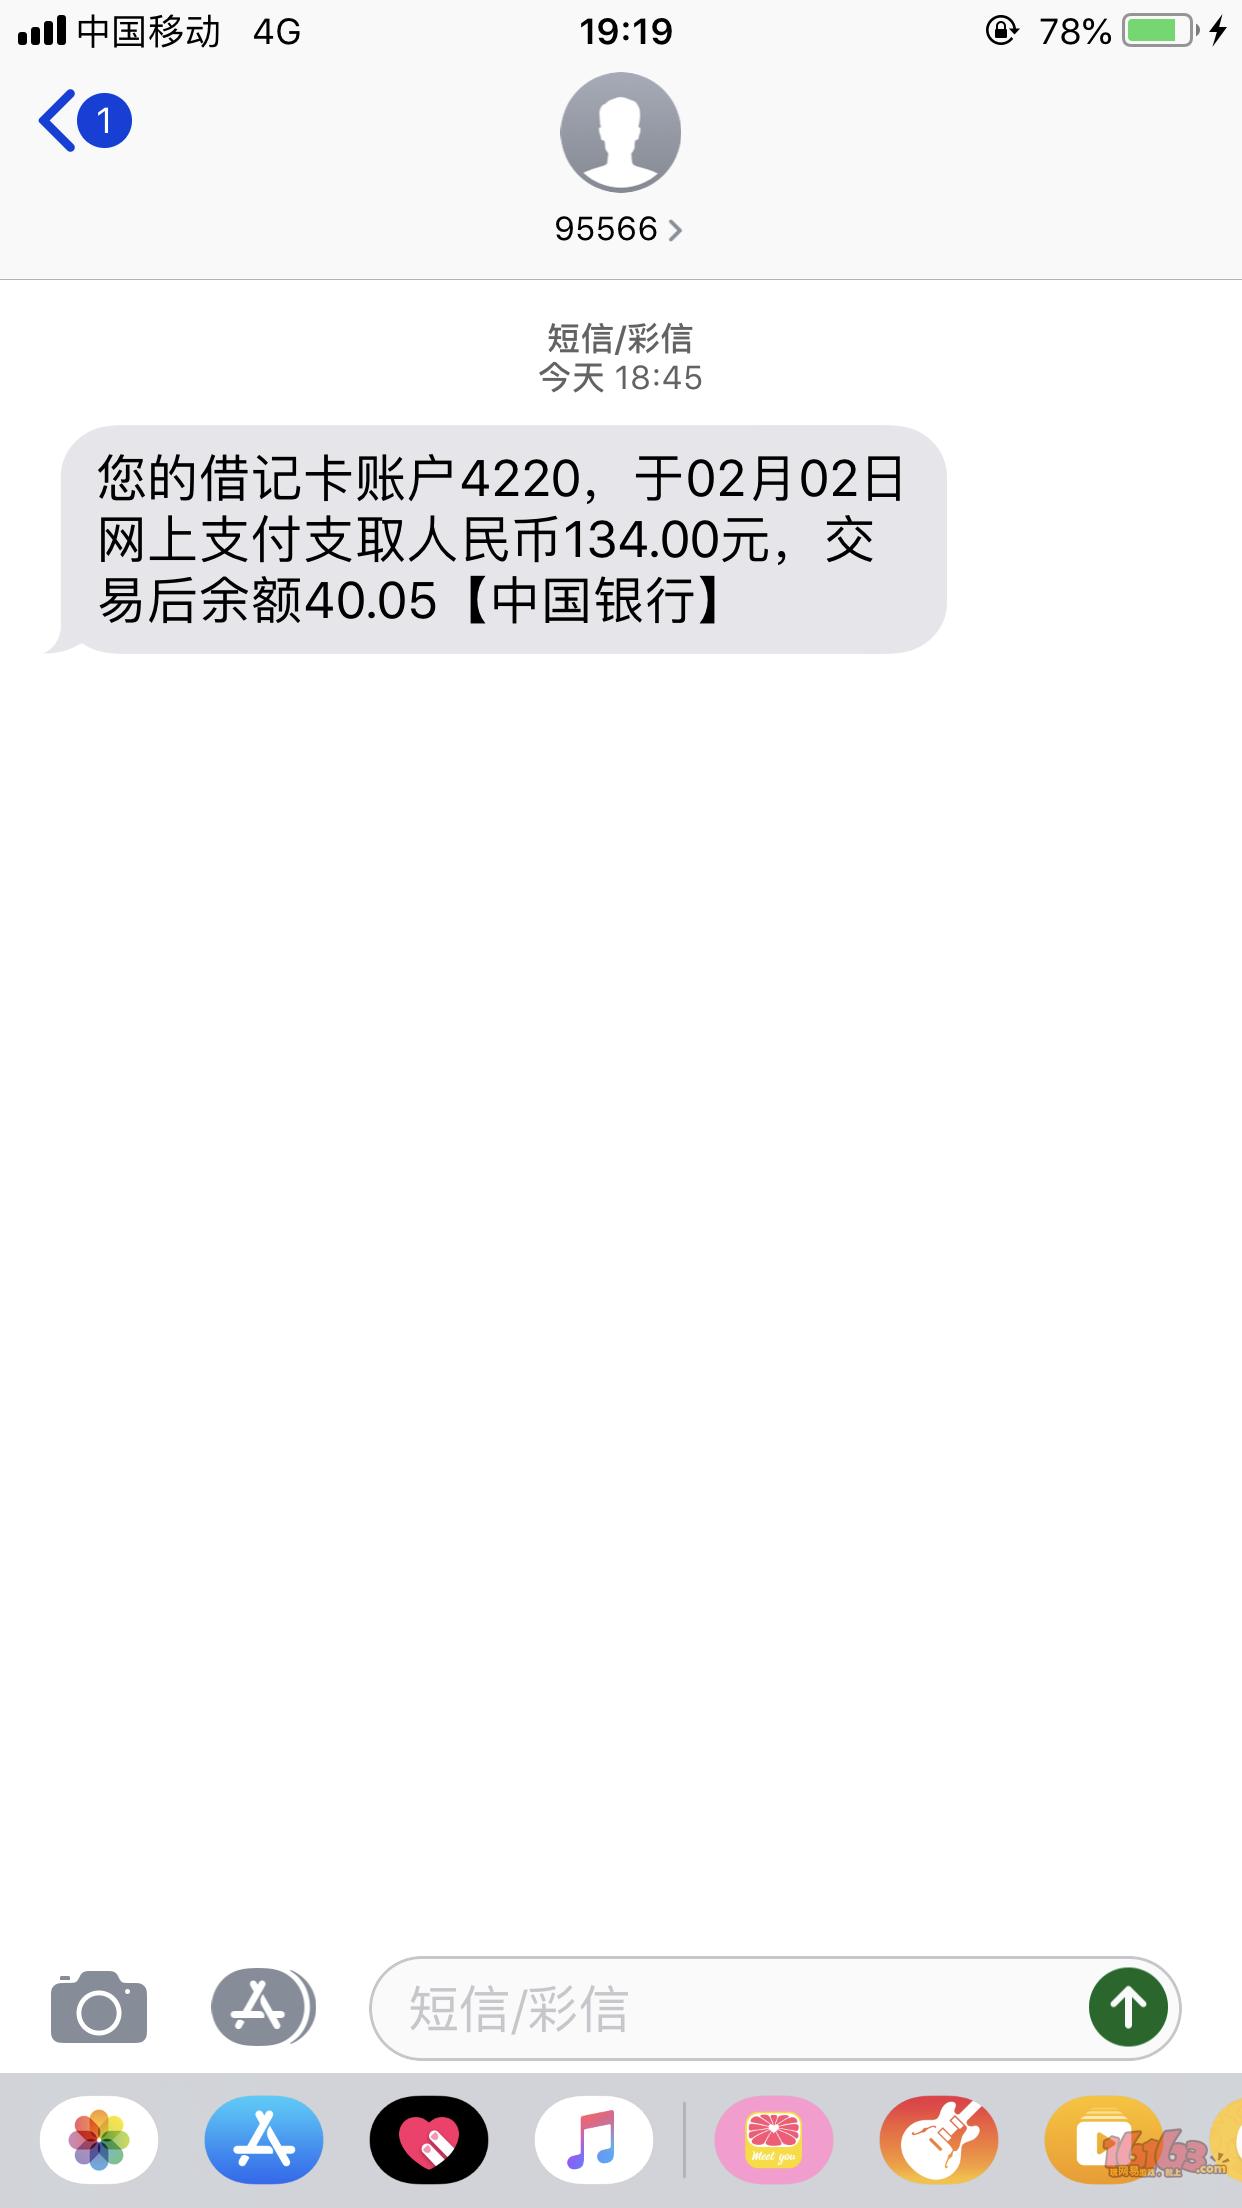 9275915C-9872-4274-AB10-18336280D7A7.png